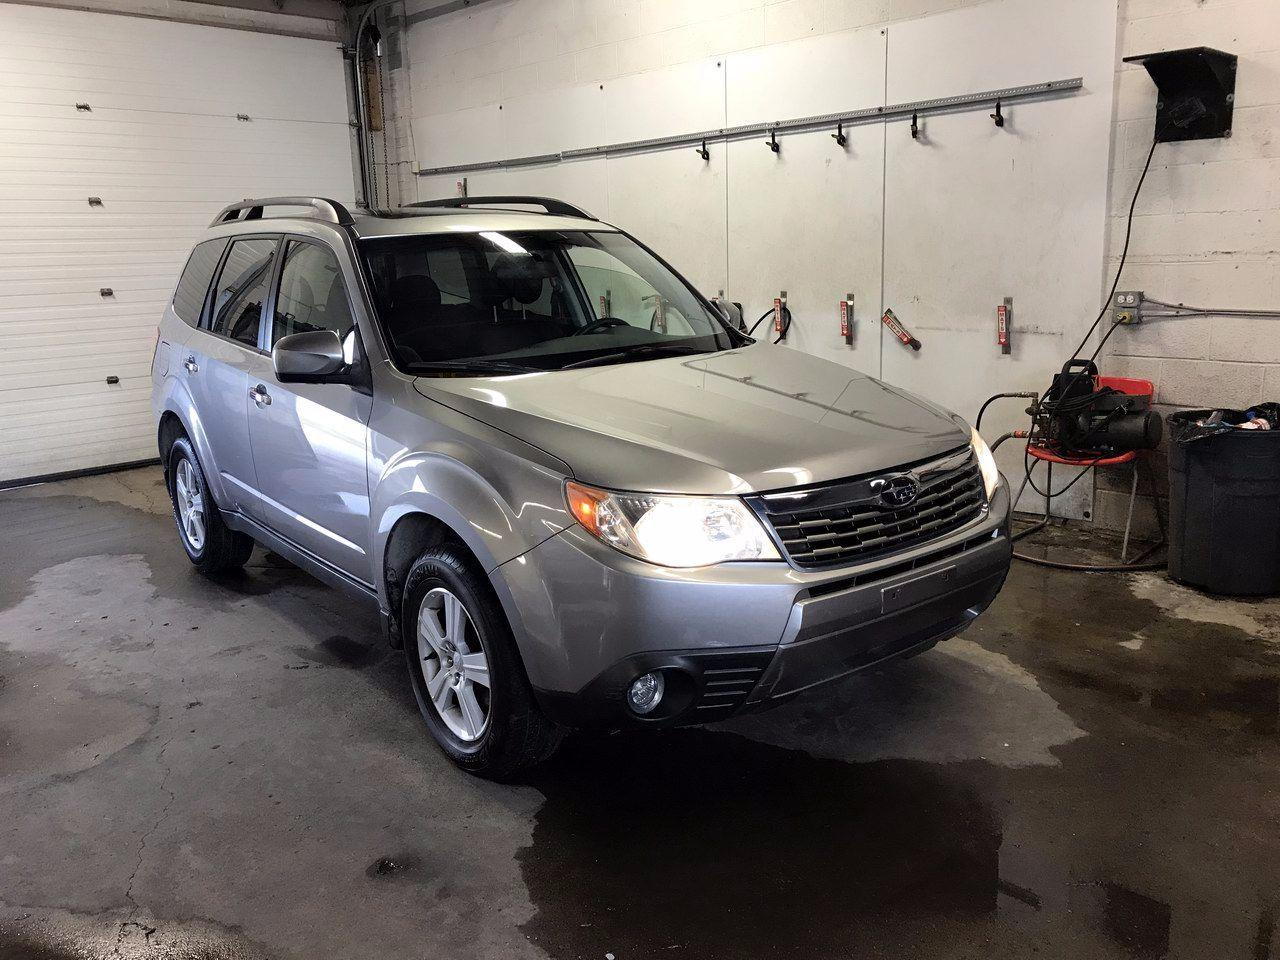 Photo of Silver 2009 Subaru Forester